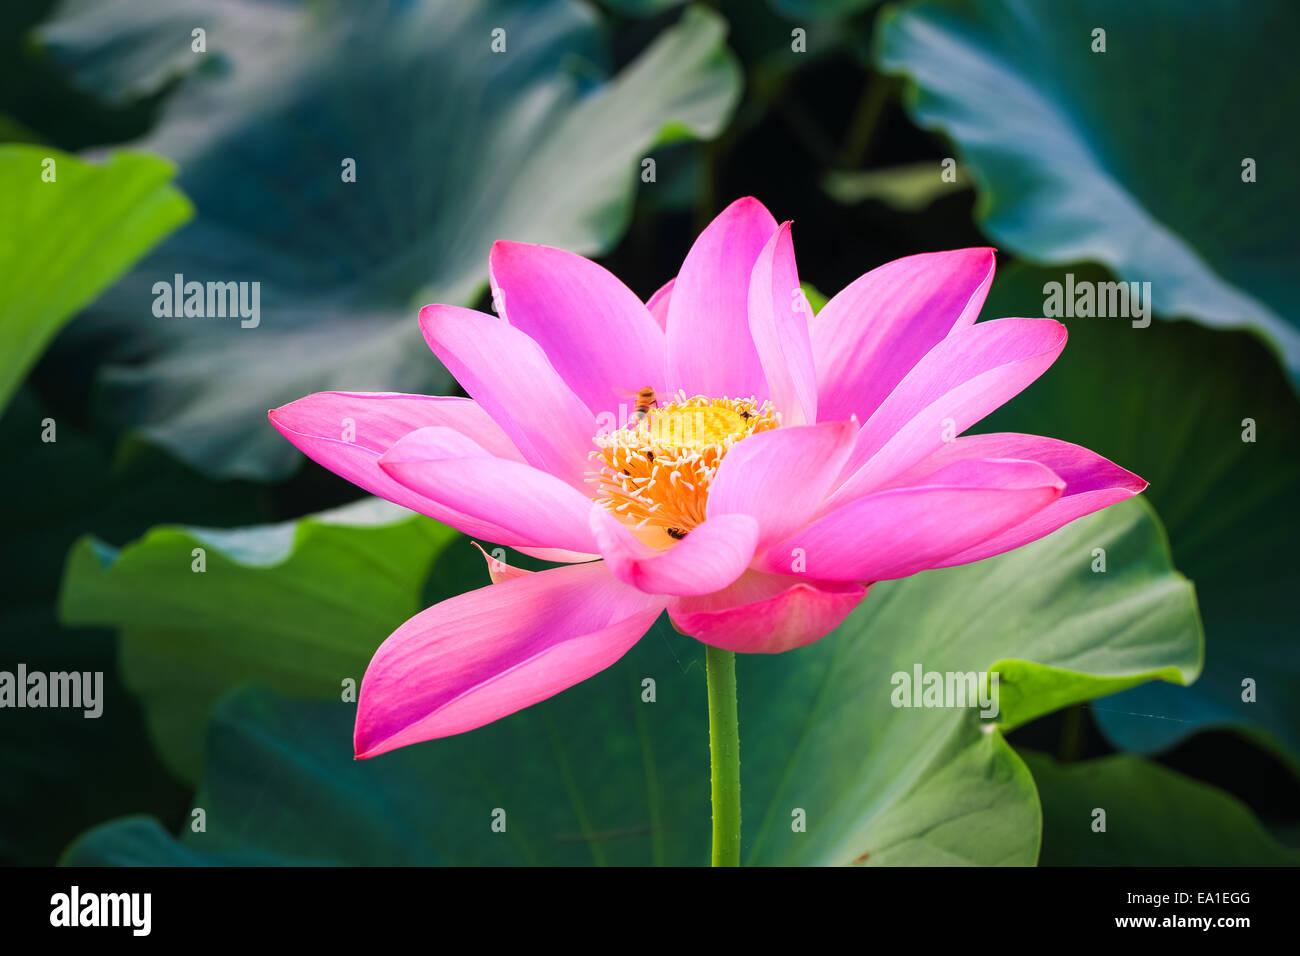 Beautiful lotus flower in blooming stock photo 75021424 alamy beautiful lotus flower in blooming izmirmasajfo